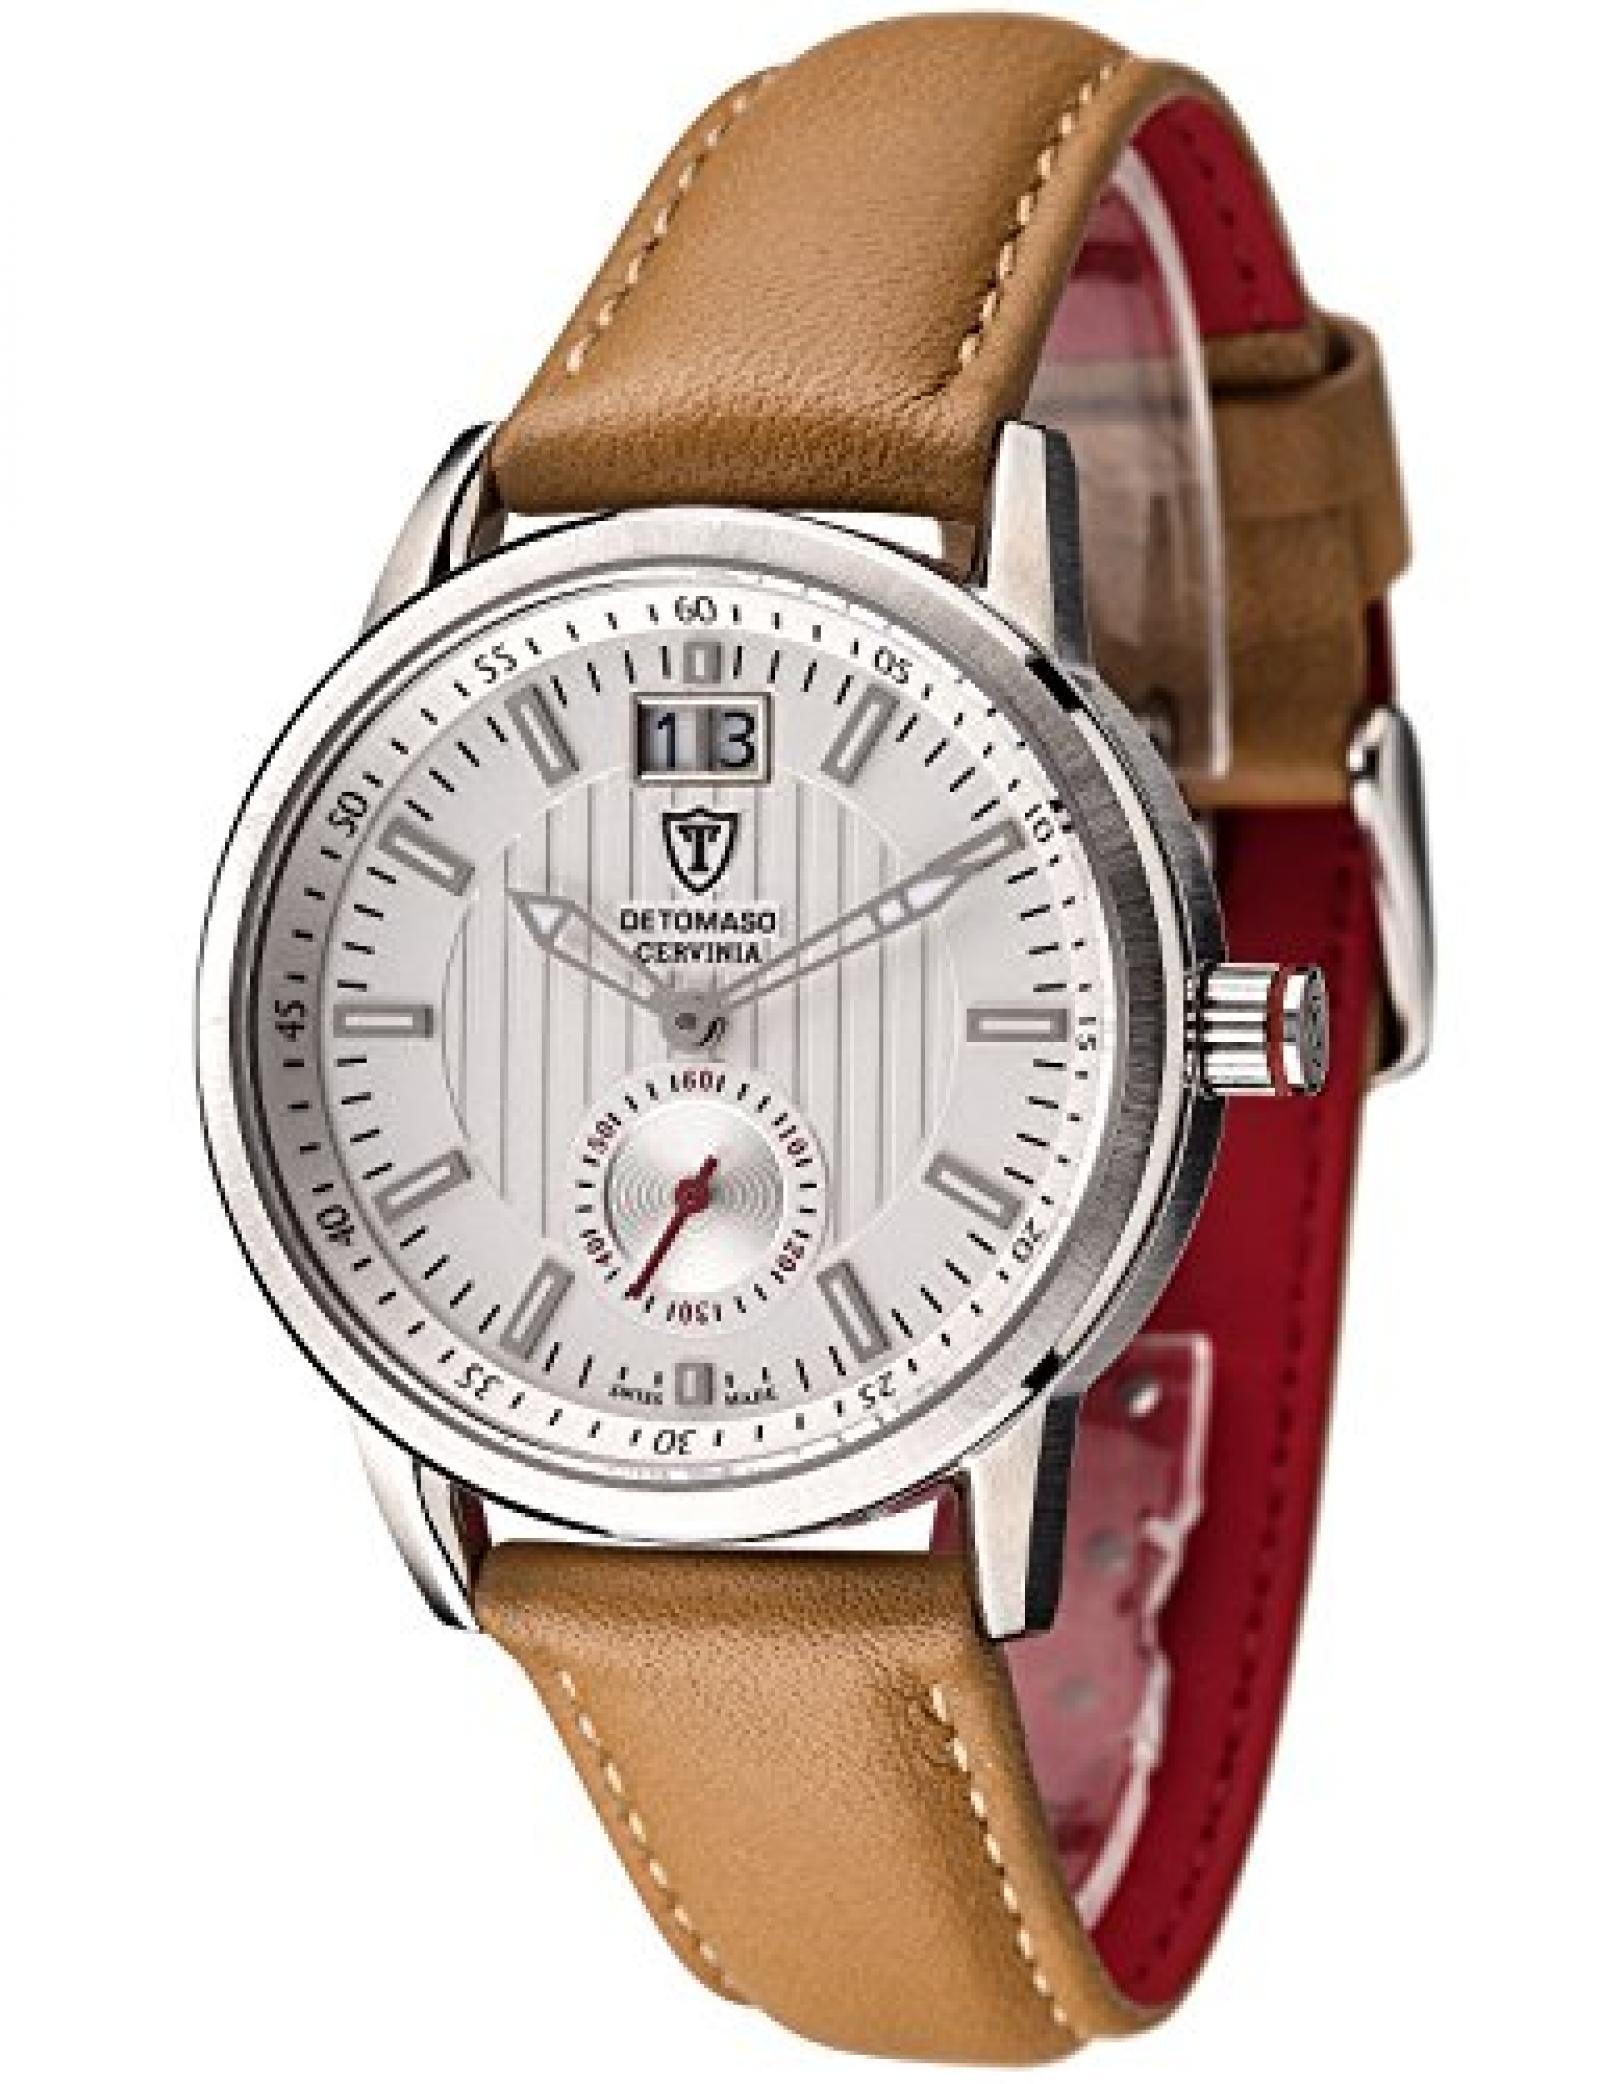 Detomaso Damen-Armbanduhr CERVINIA SWISS MADE Silber/Braun Ladies Analog Quarz Leder DT3023-D